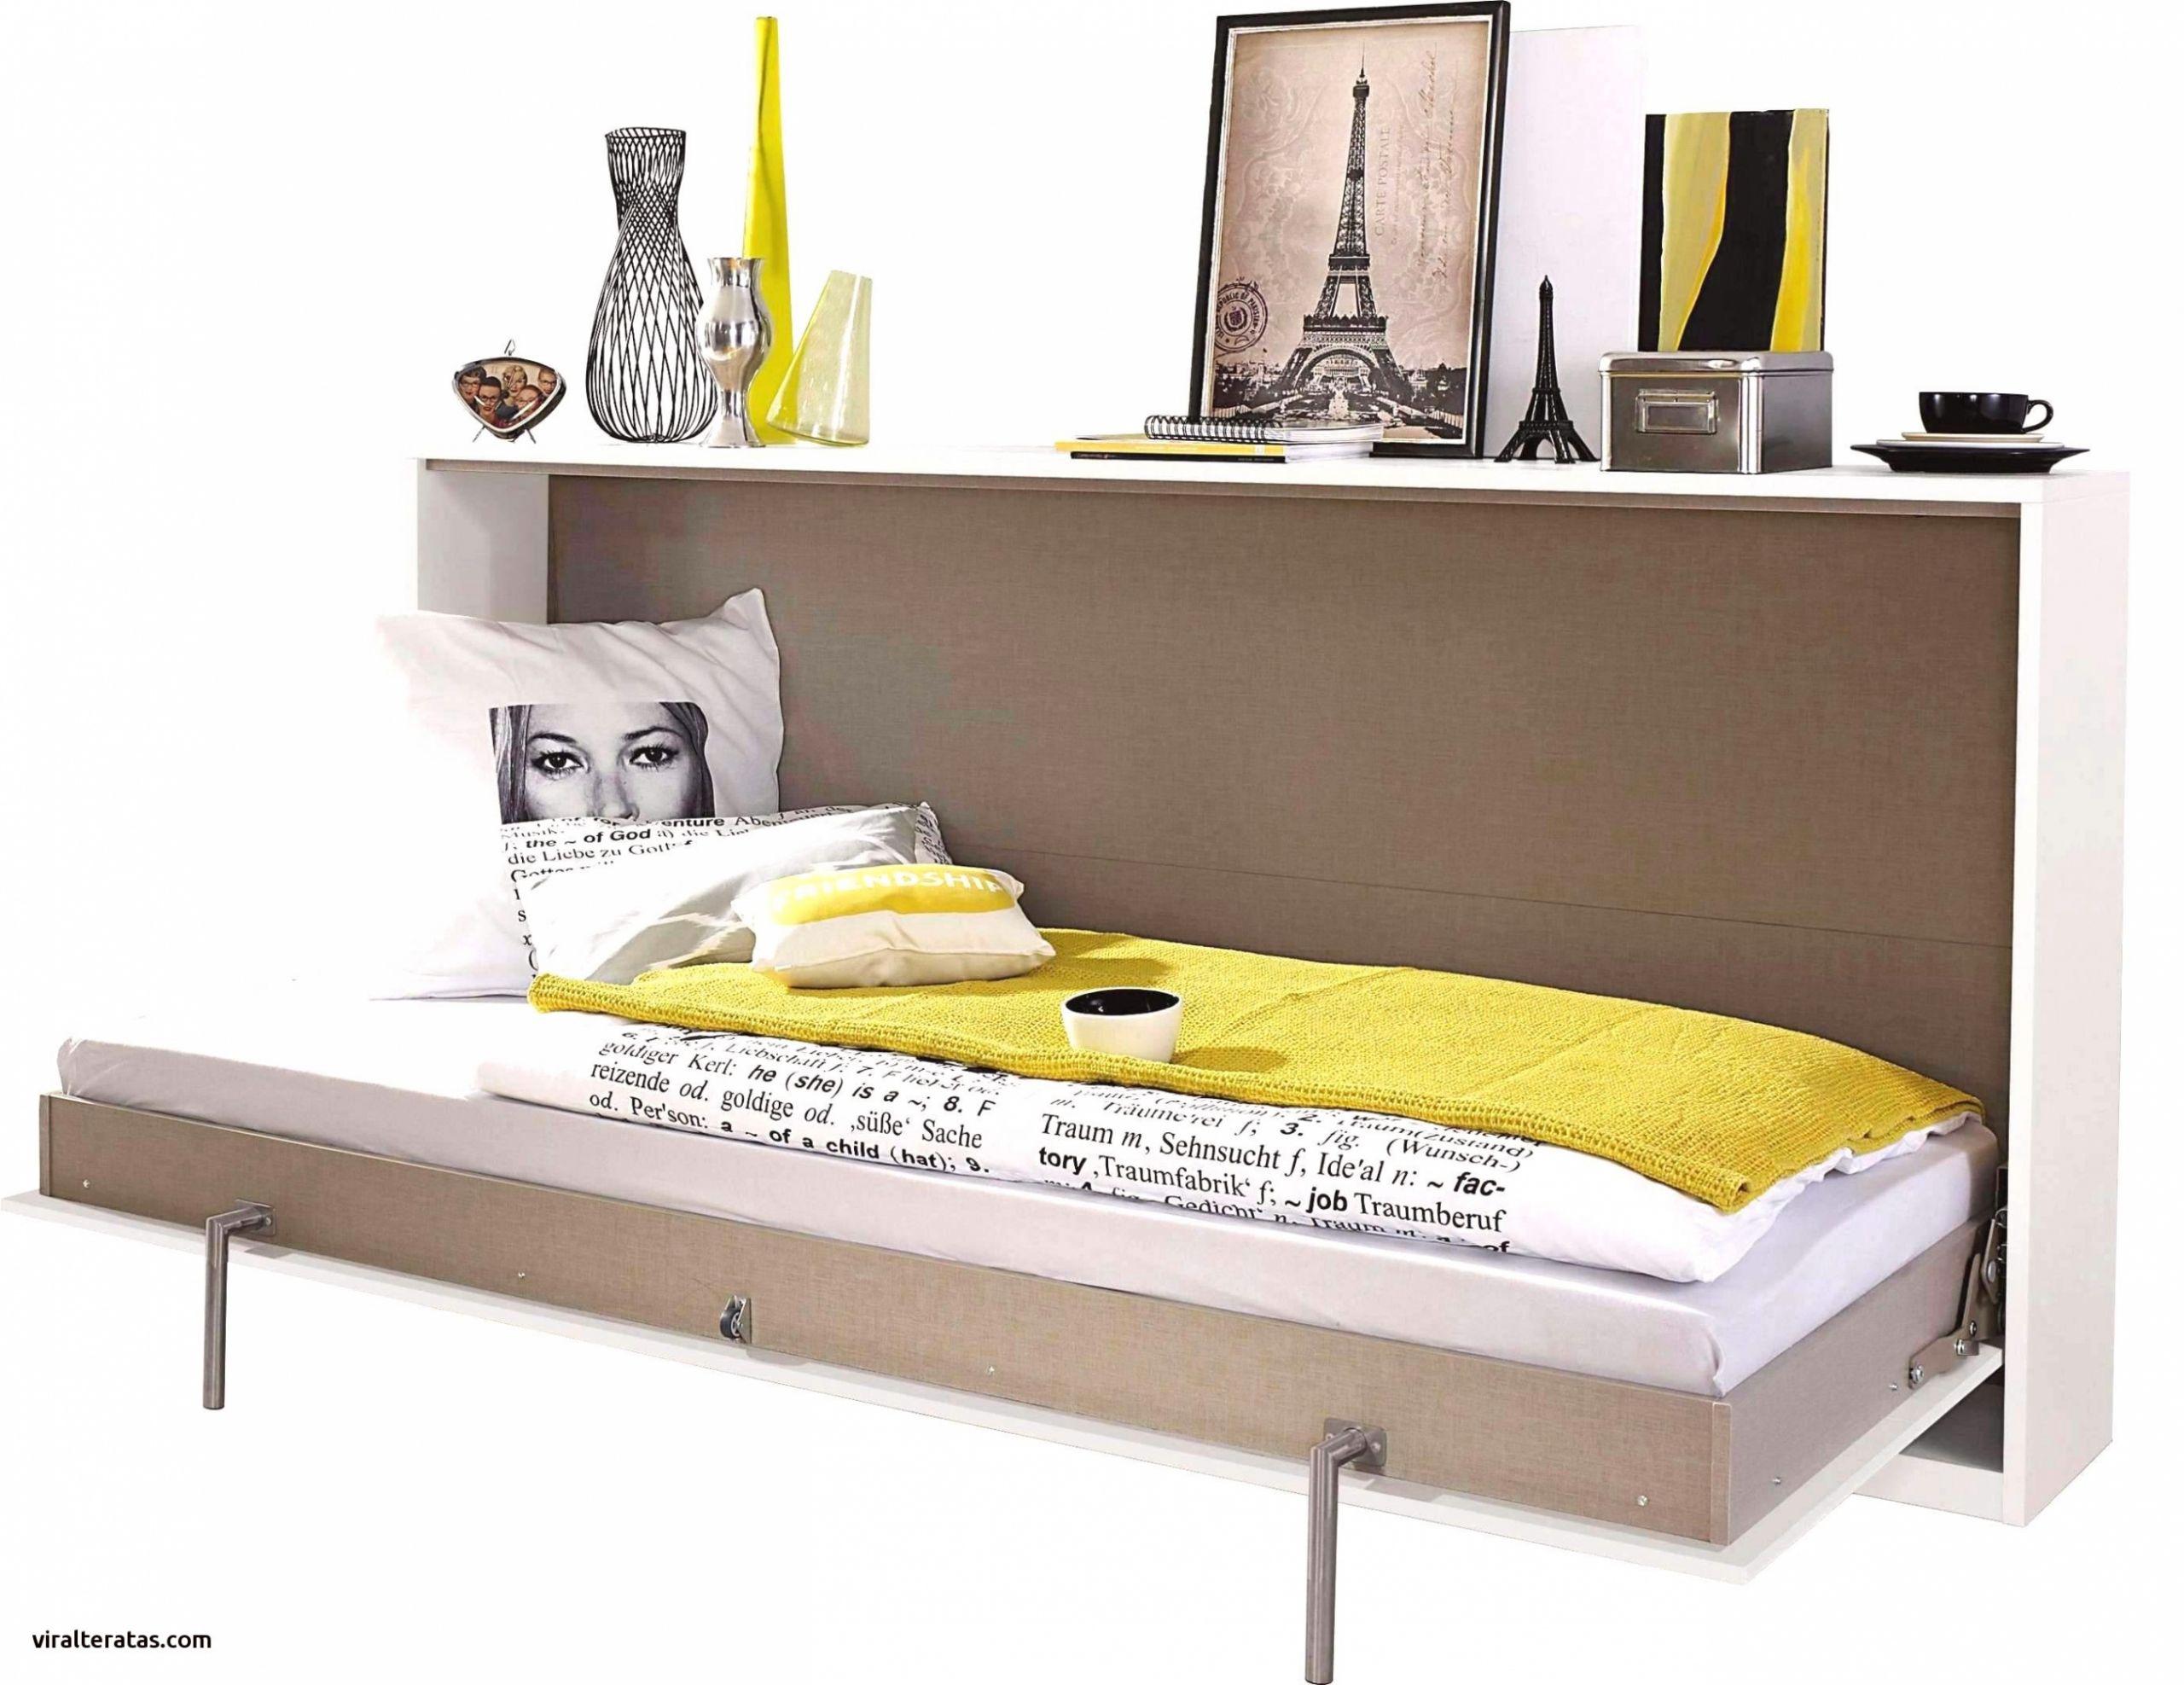 luxus ikea ideen fur schlafzimmer ideen fur wandgestaltung ideen fur wandgestaltung 1